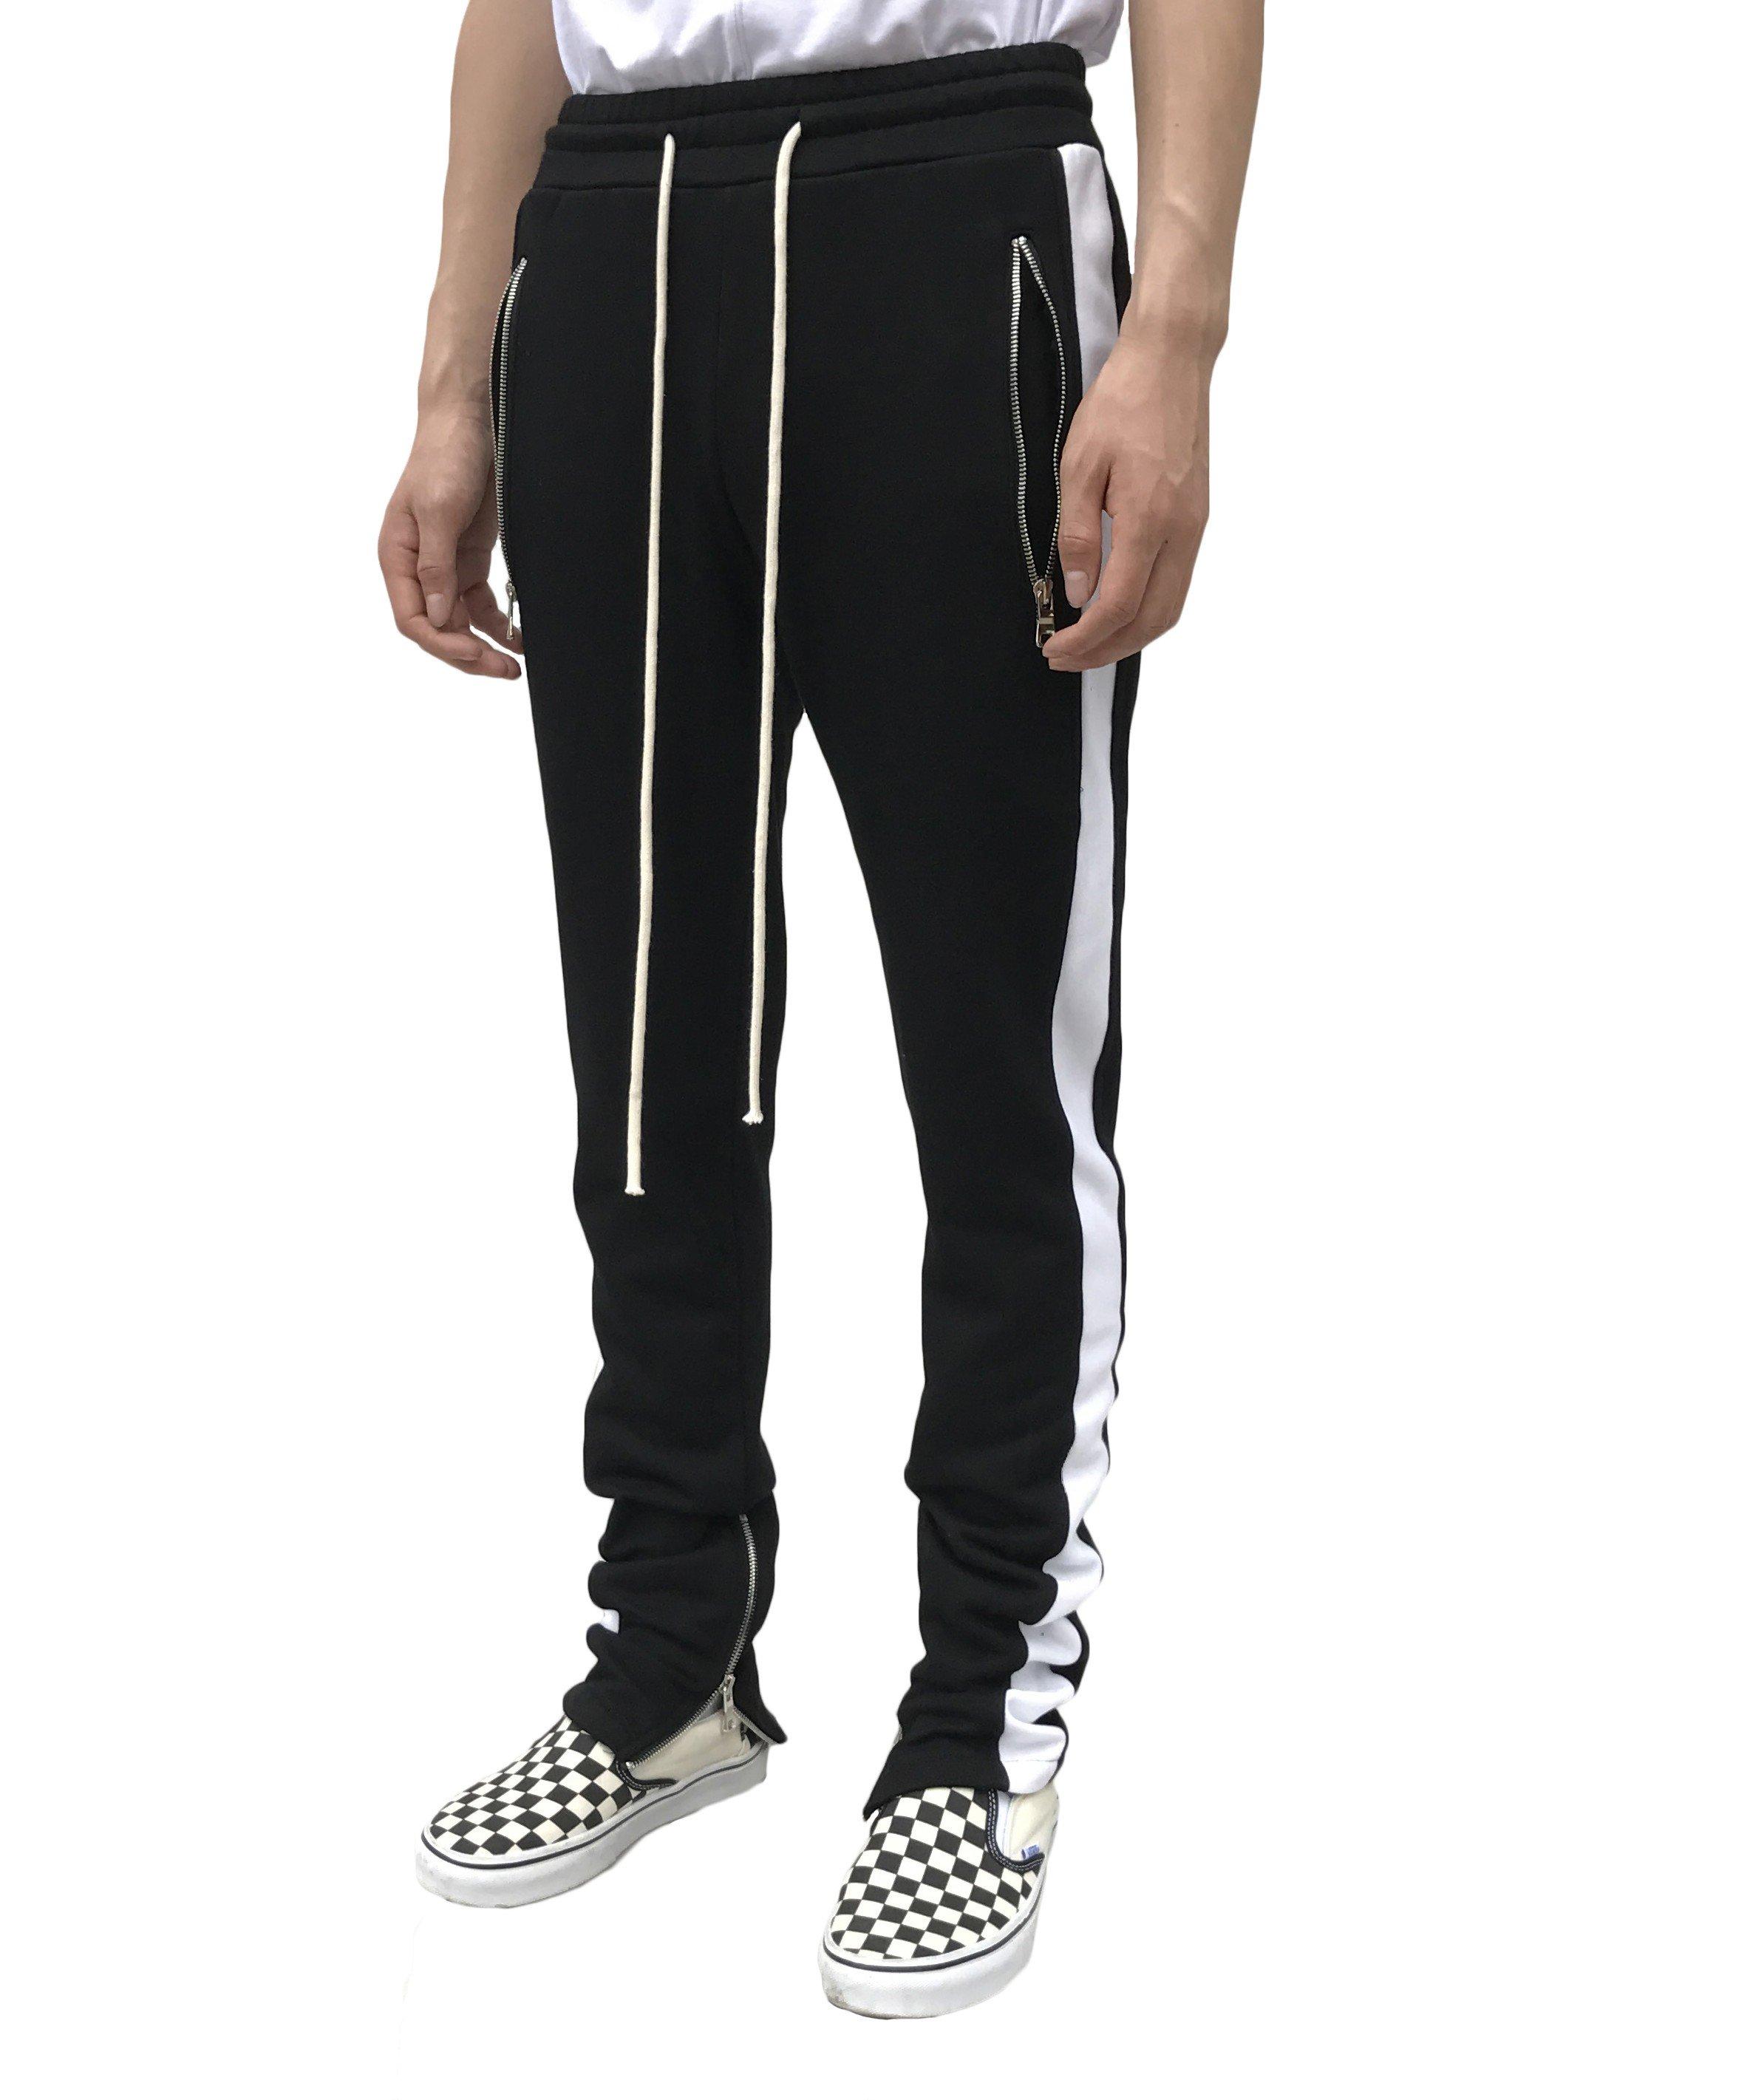 Zip Track Pant Tutt Designs